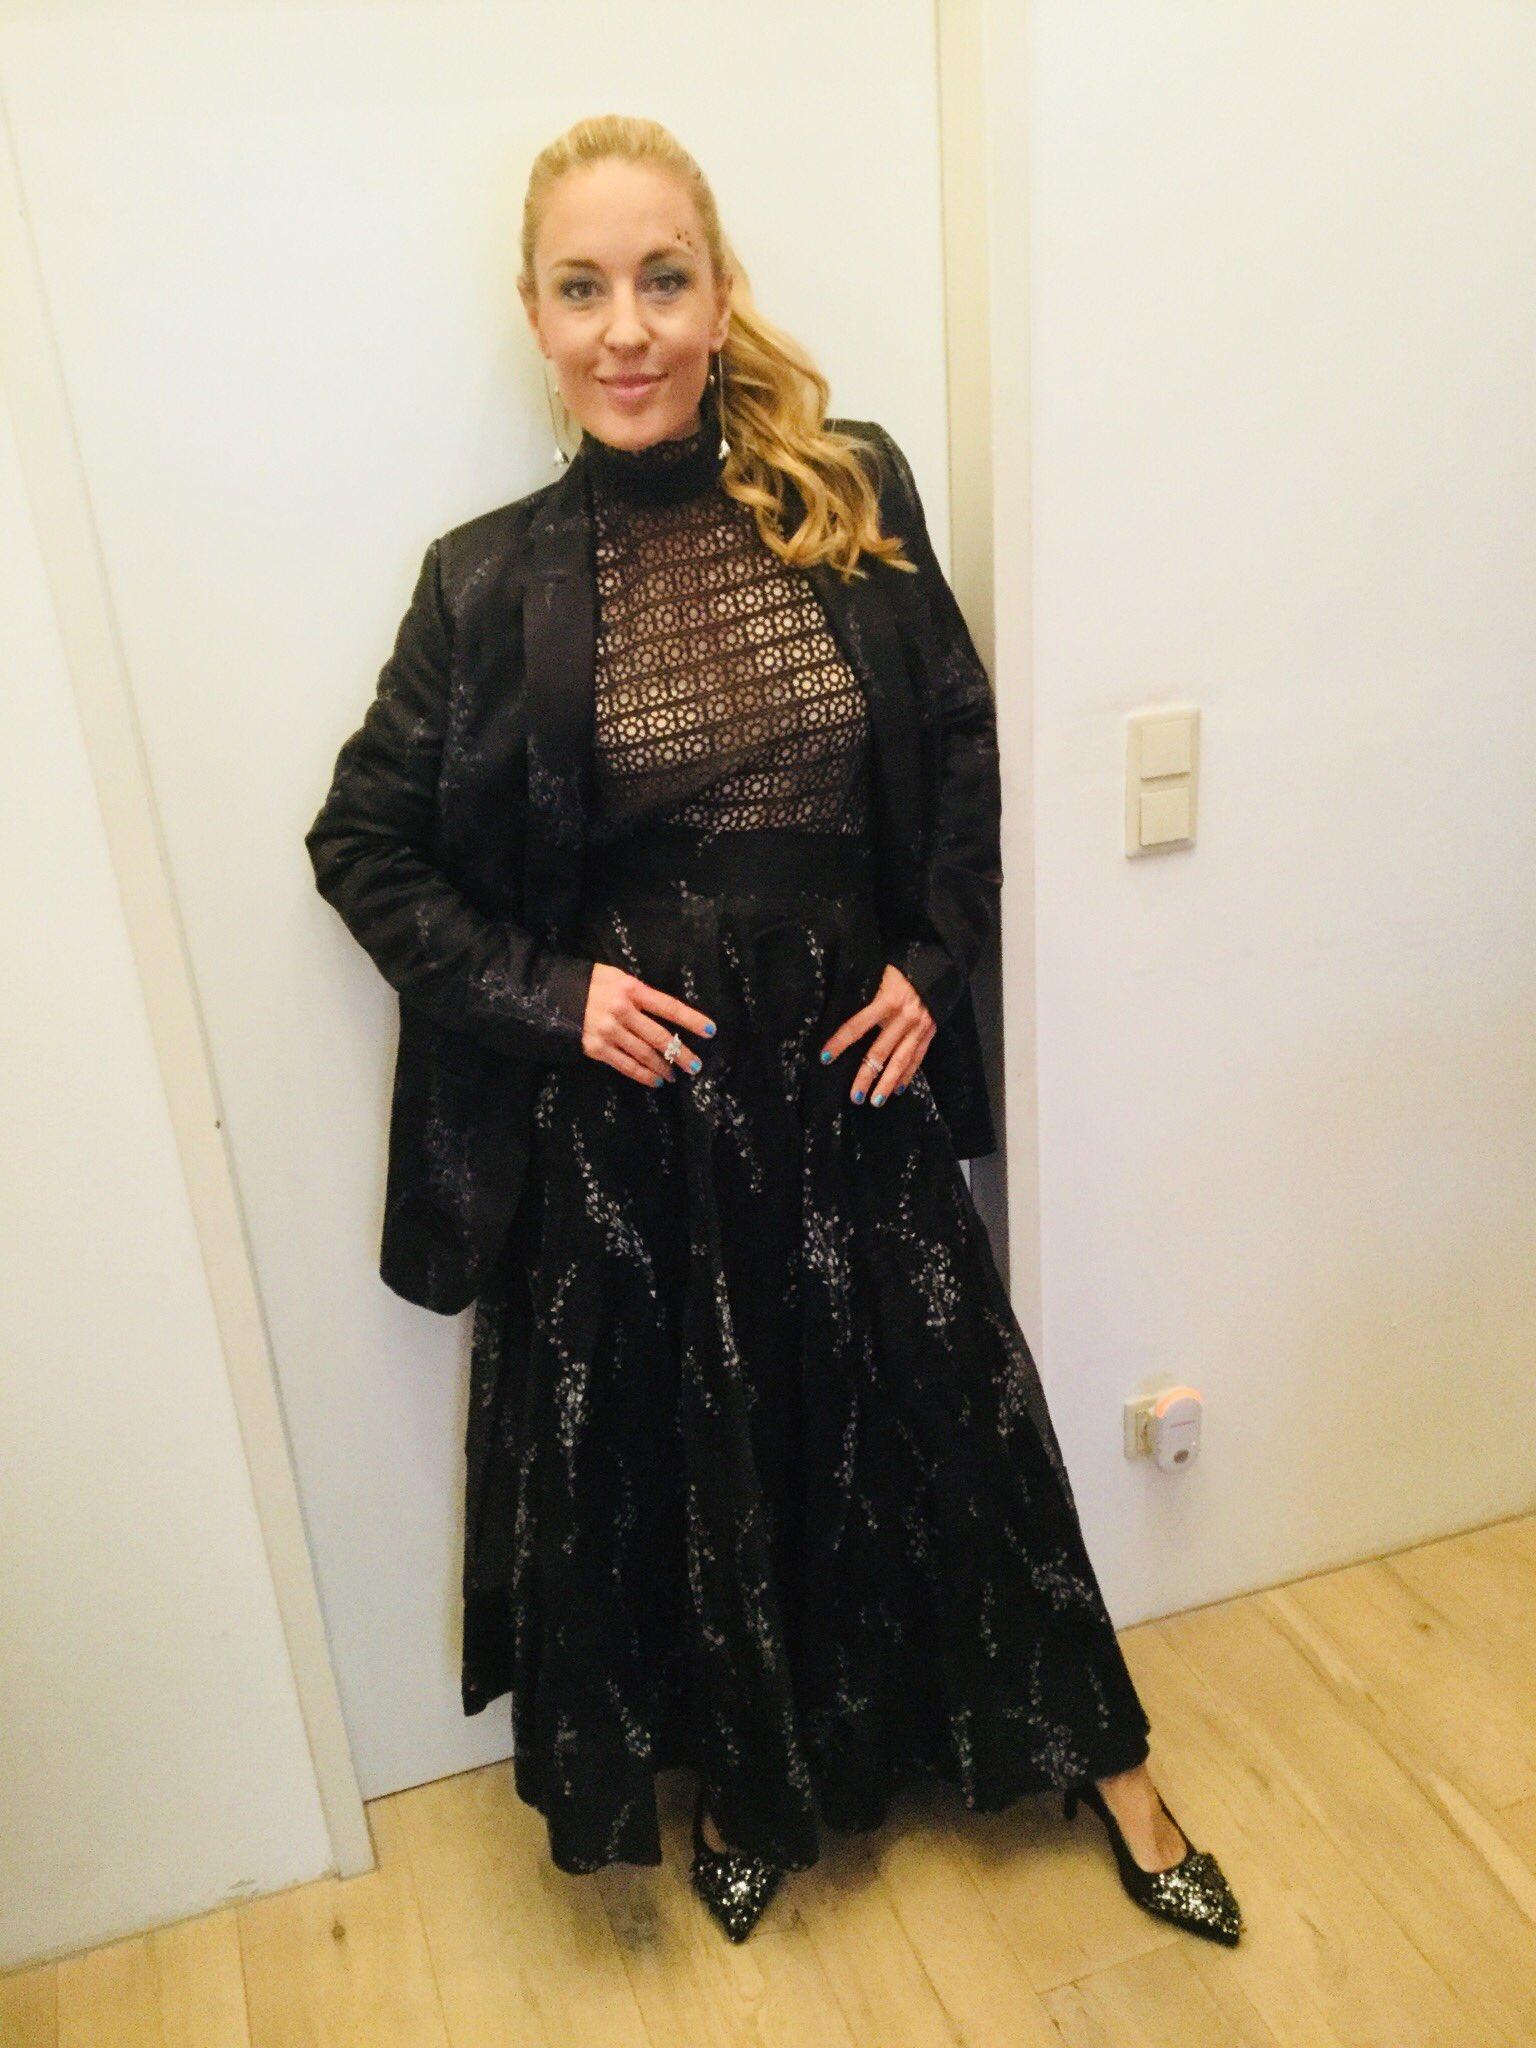 LILIAN KLEBOW on Twitter: Man ist als Mama ja so dankbar